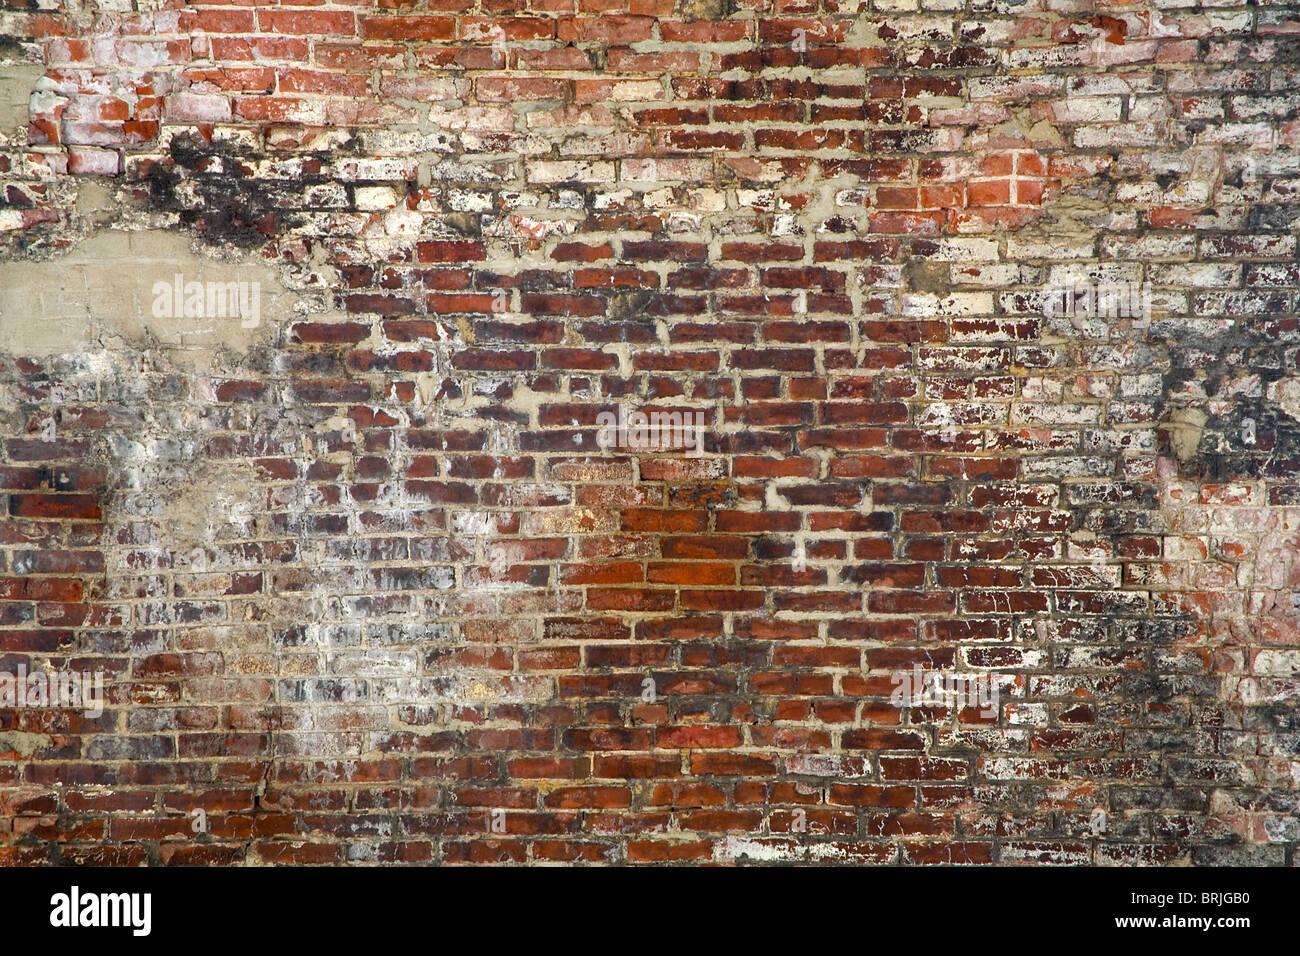 Brick Wall - Stock Image